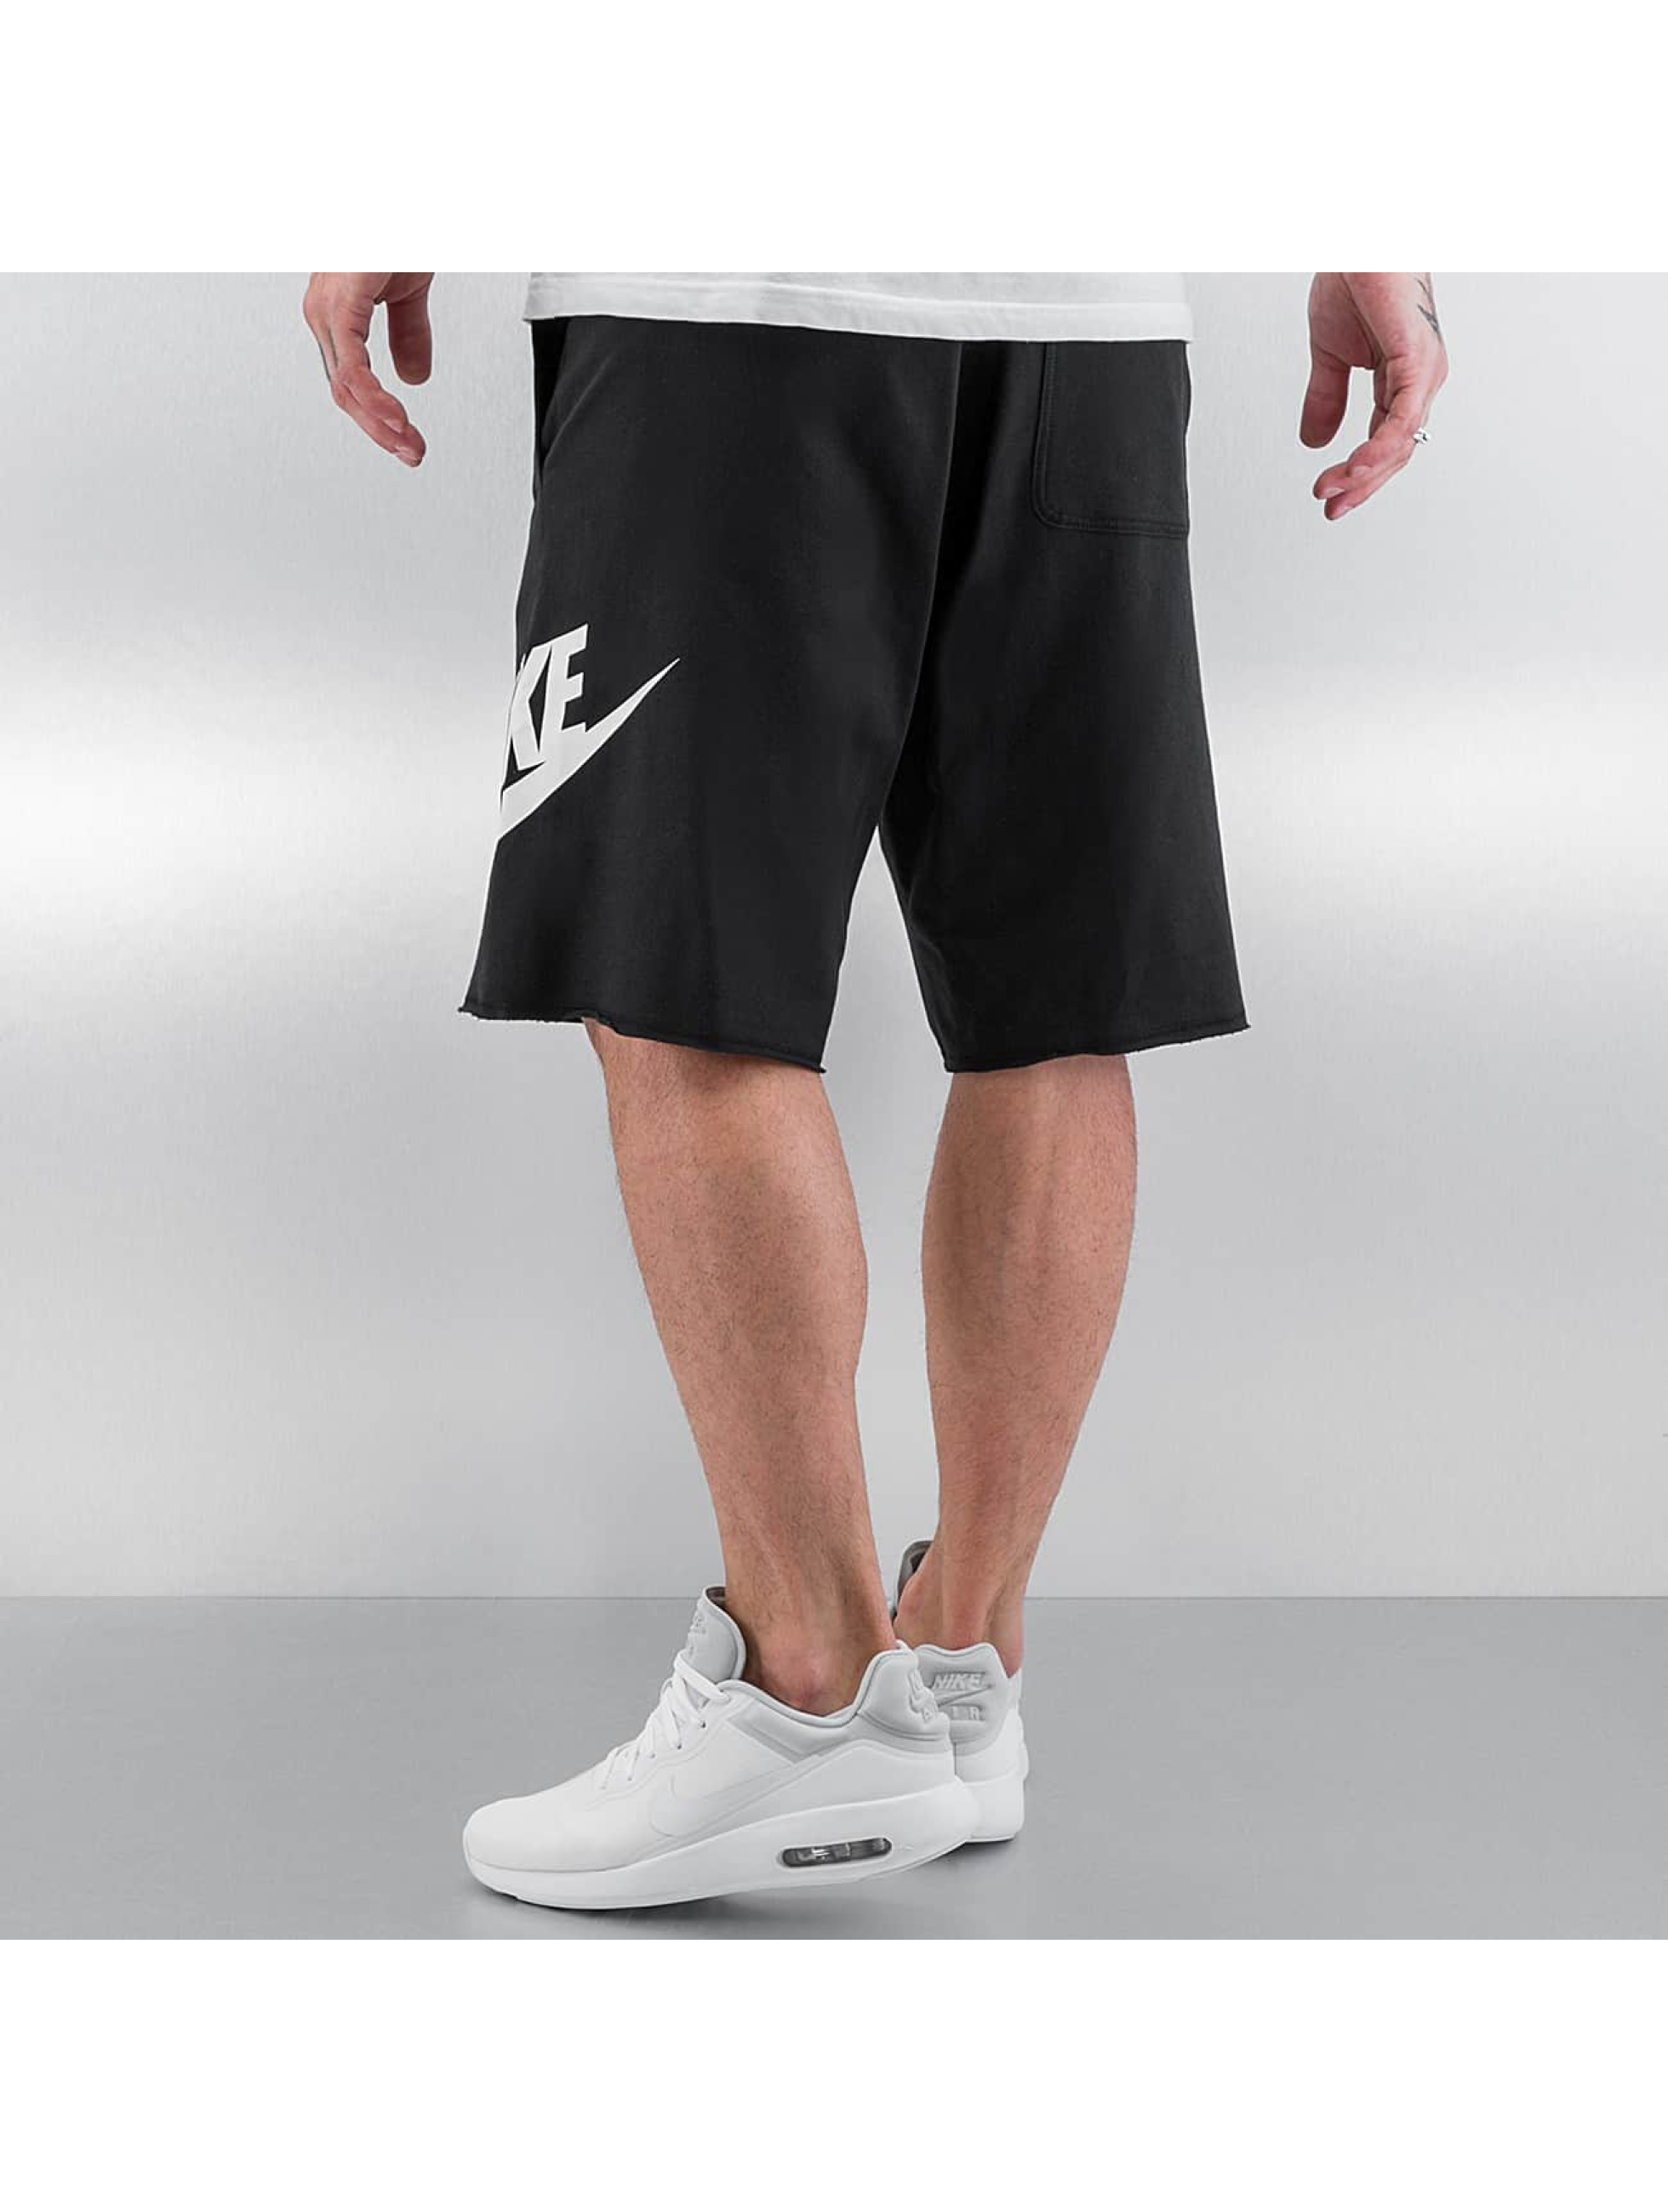 Nike Short NSW FT GX black